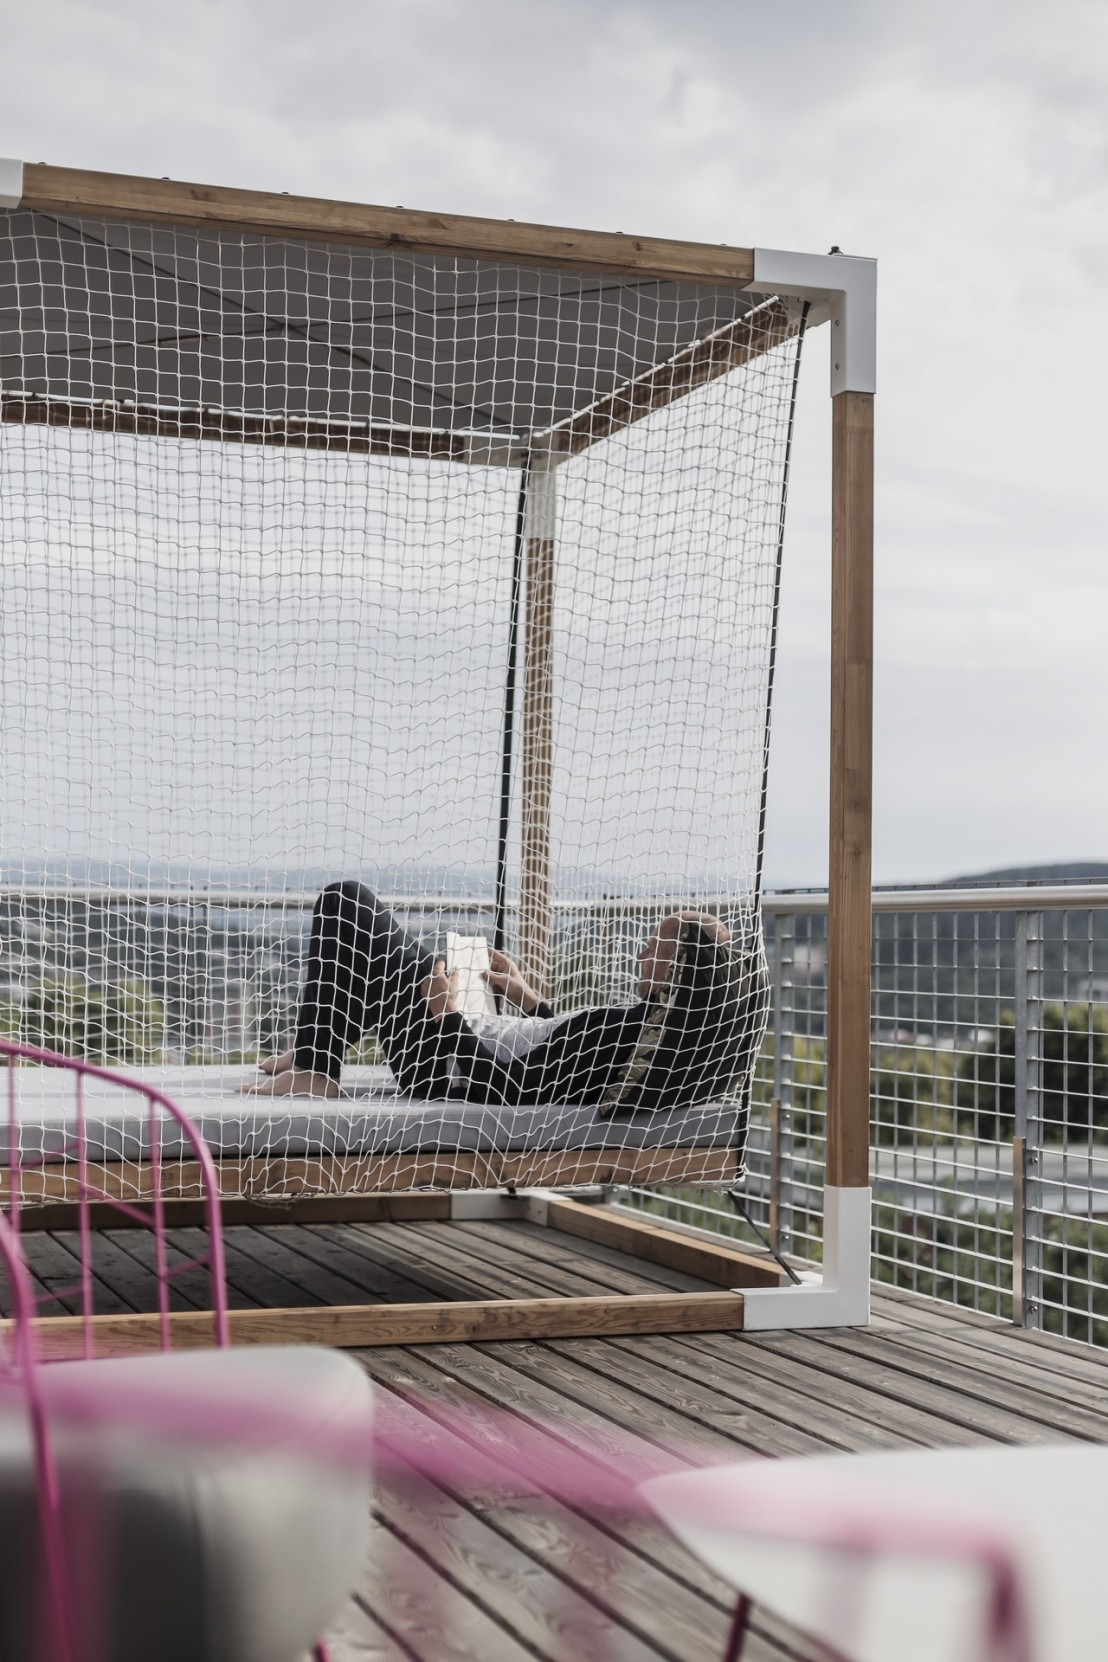 Lit De Jardin Hamac Suspendu En Cage Leva Mobilier De